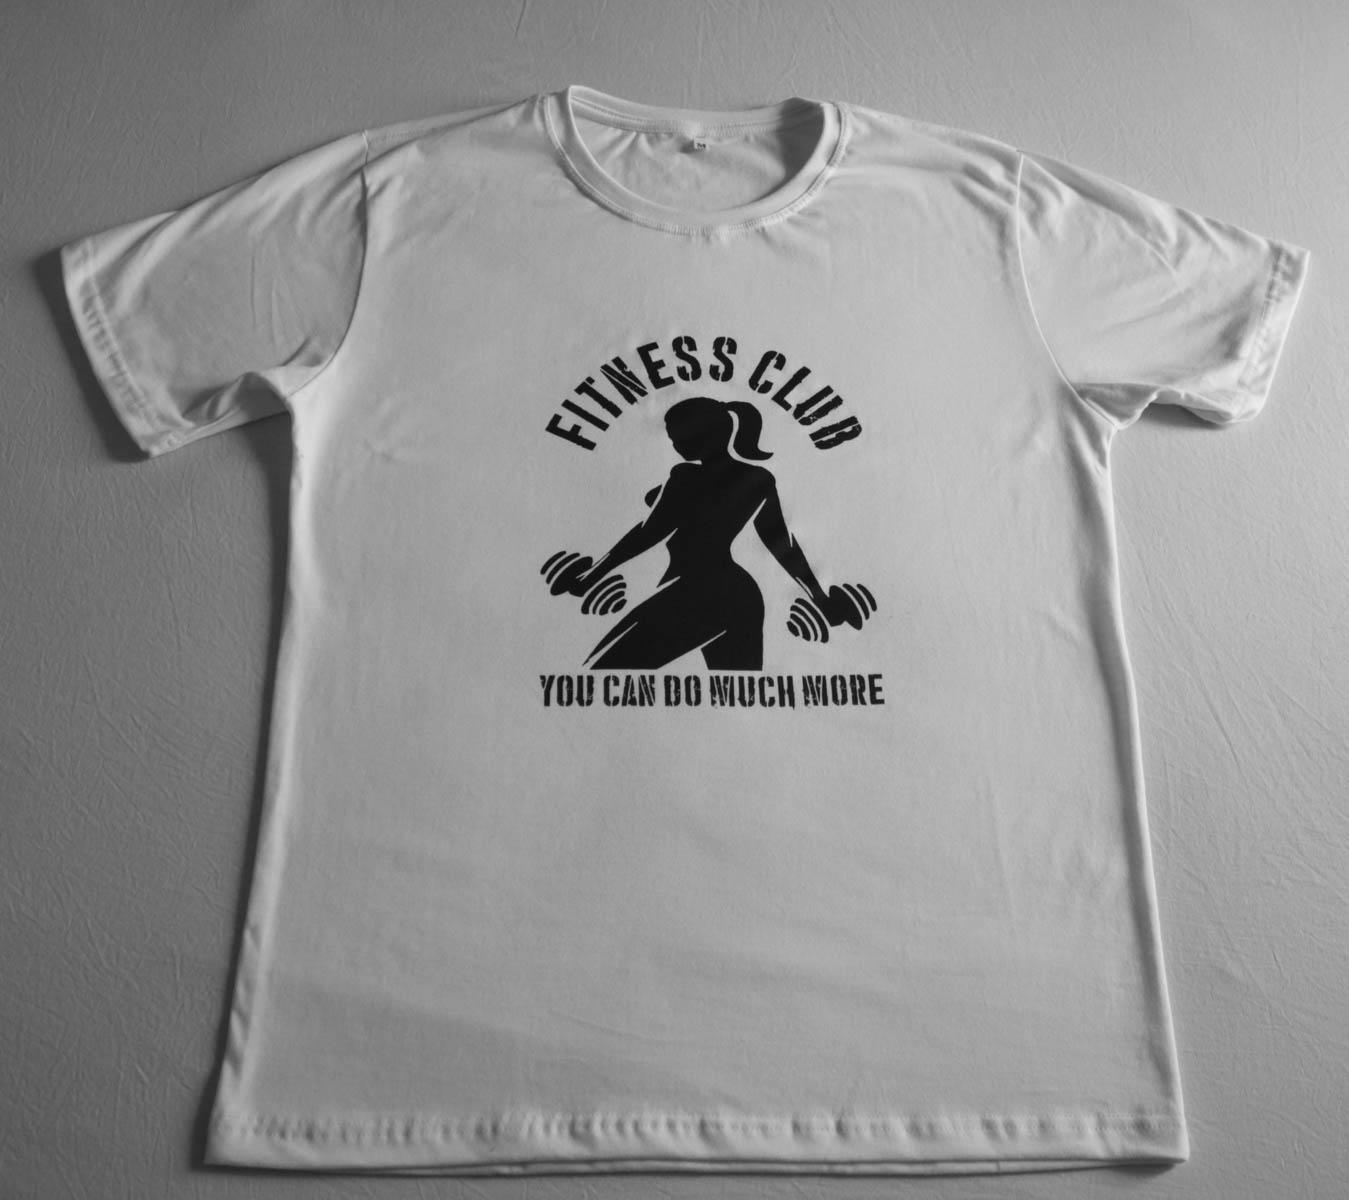 027ef6c9c8cd7 Camiseta Estampada Fitness Club no Elo7